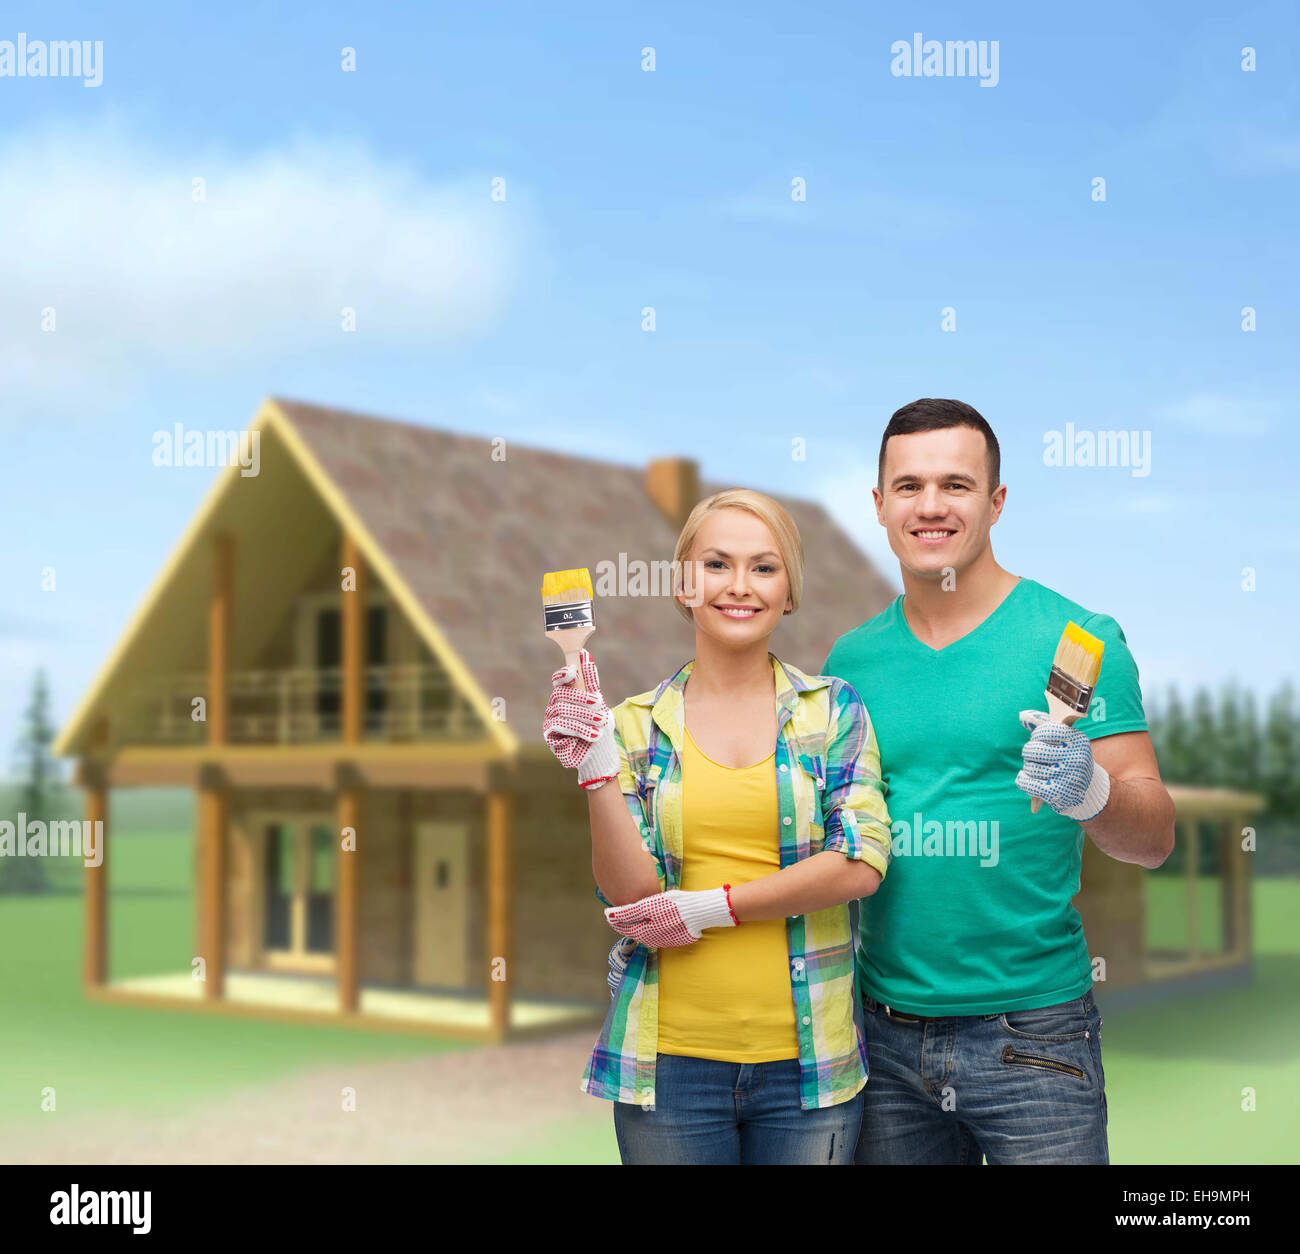 smiling couple with paintbrush - Stock Image